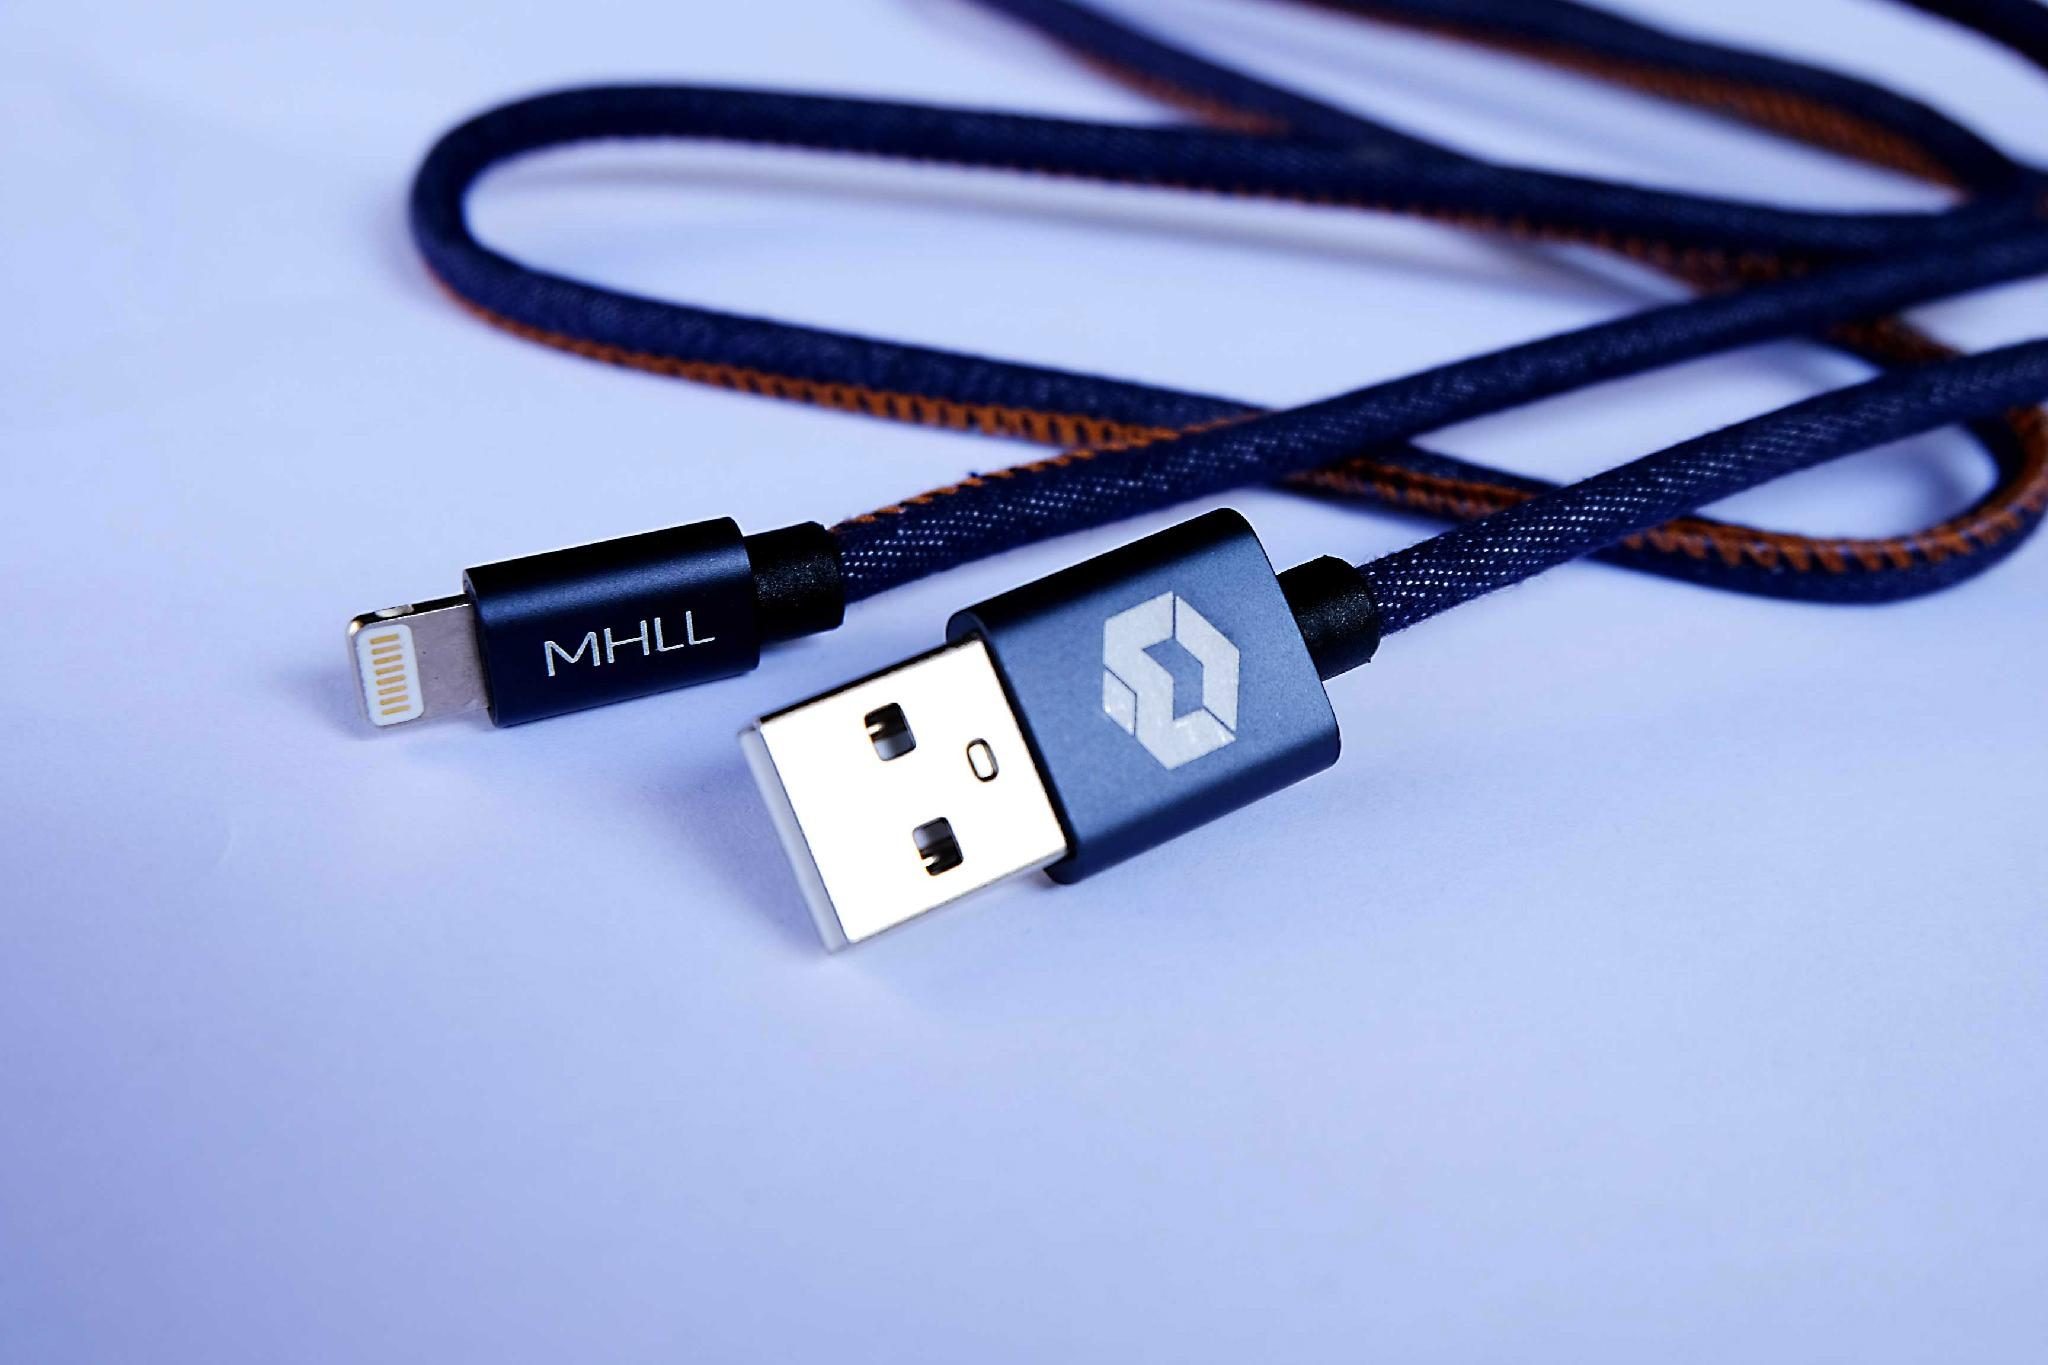 Denim Fabric iPhone Lightning USB Cable for iPhone 6 6S 6 Plus 7 Plus 1